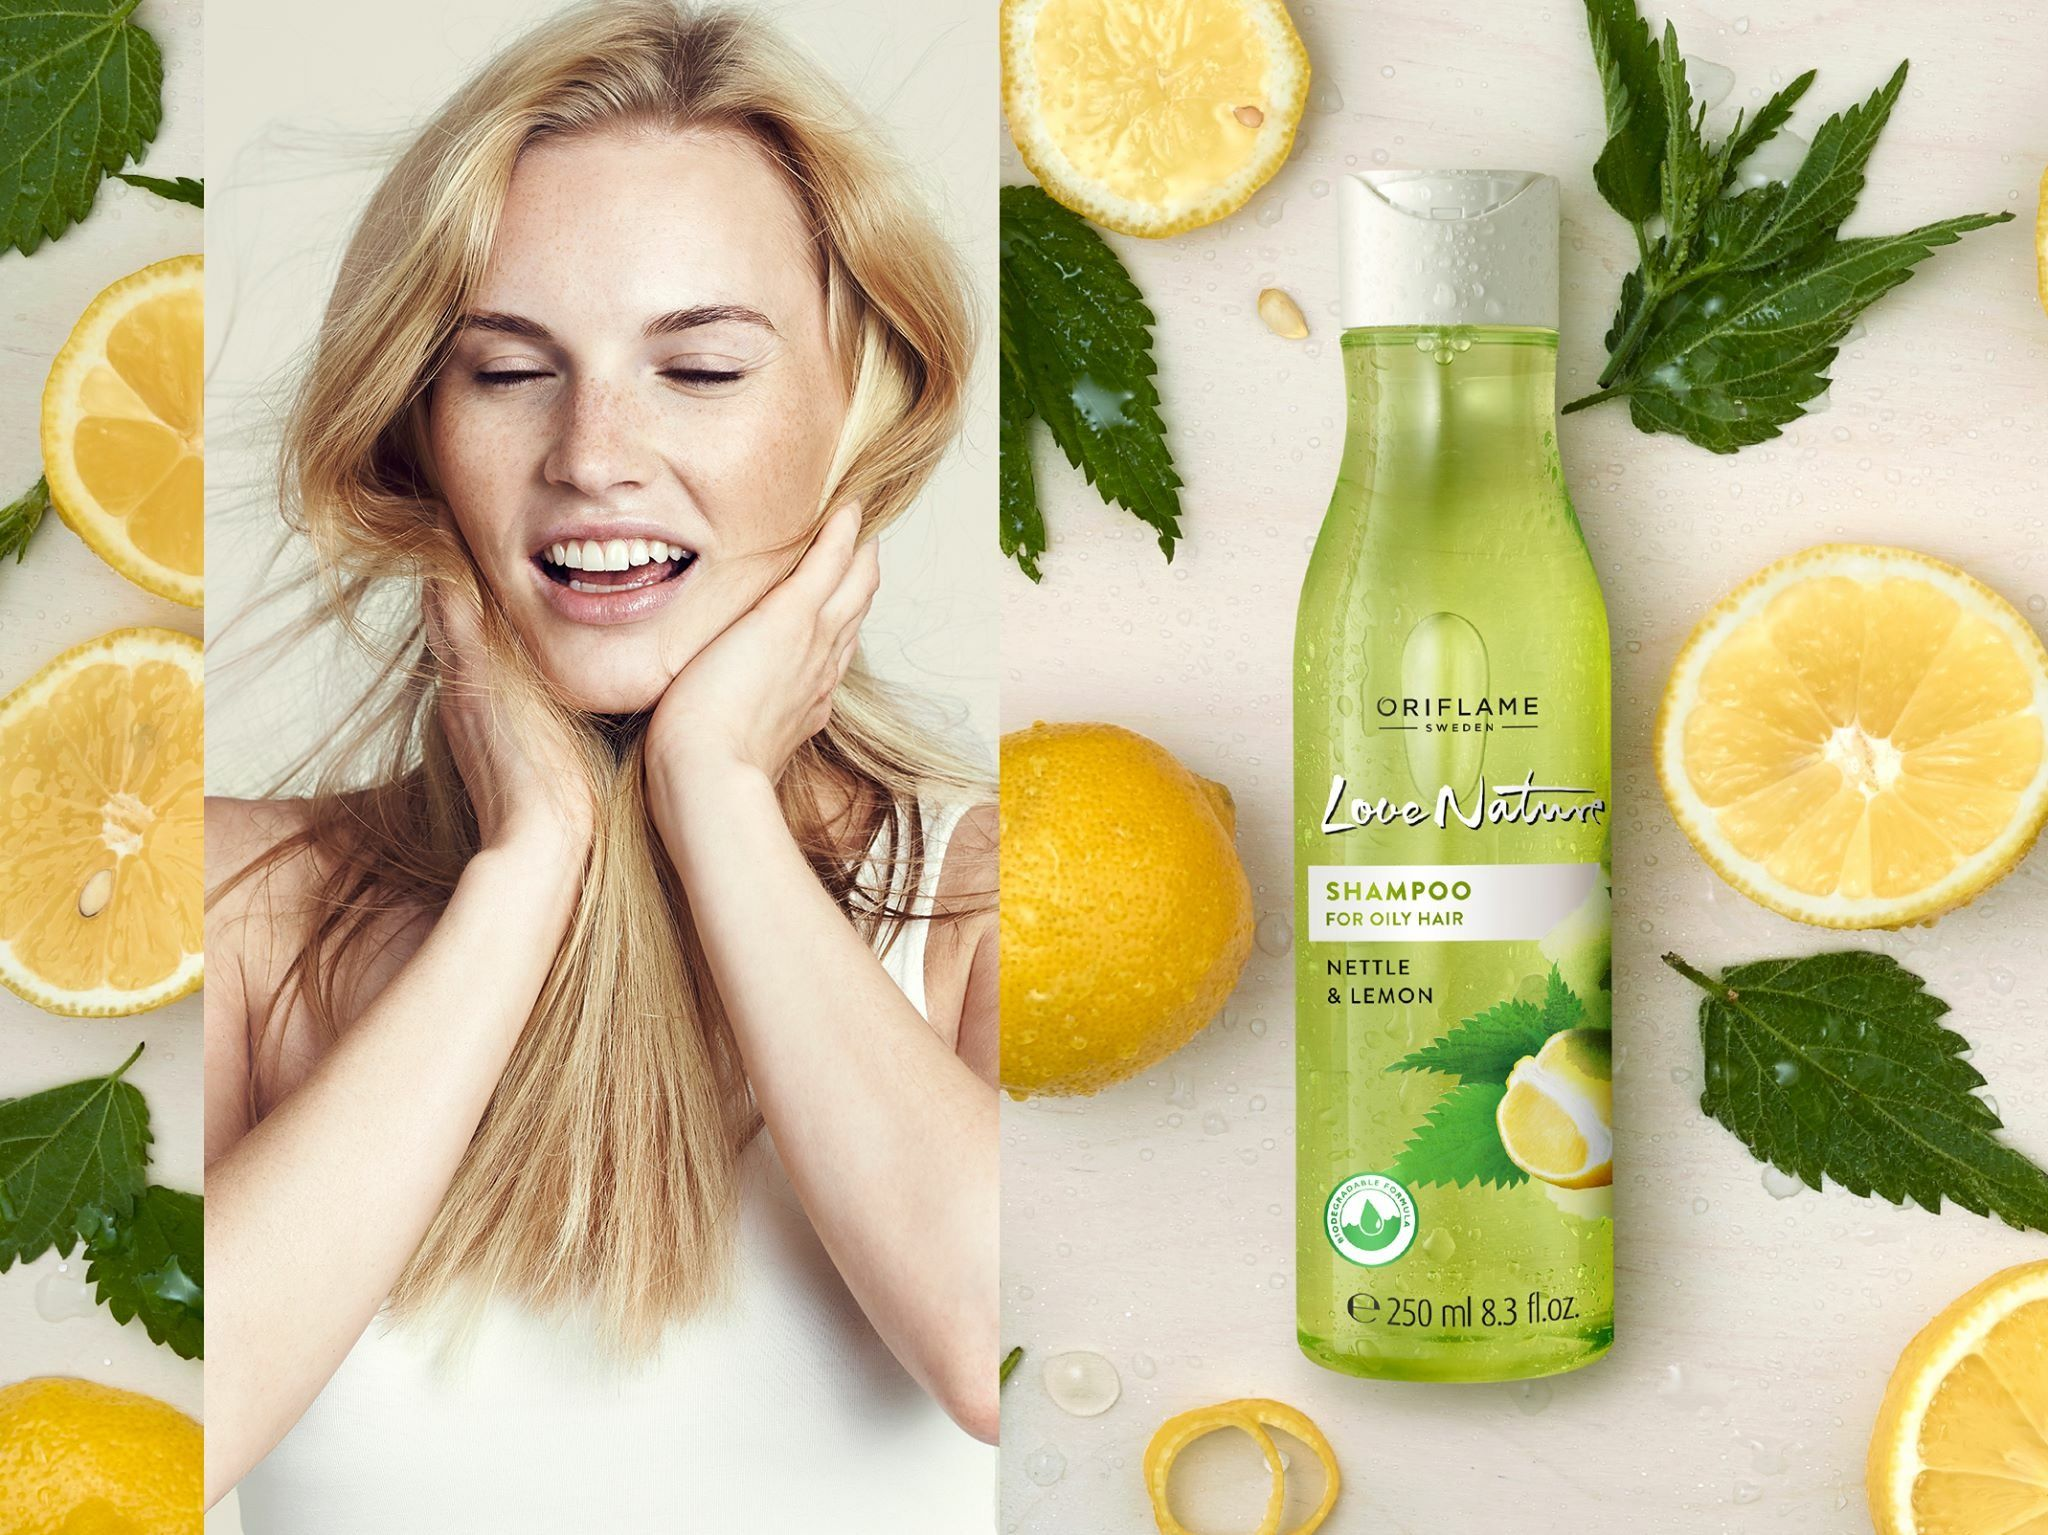 Love Nature Avocado Oil & Chamomile 2in1 Shampoo & Conditioner Beauty Inspiration Oriflame Cosmetics Pinterest